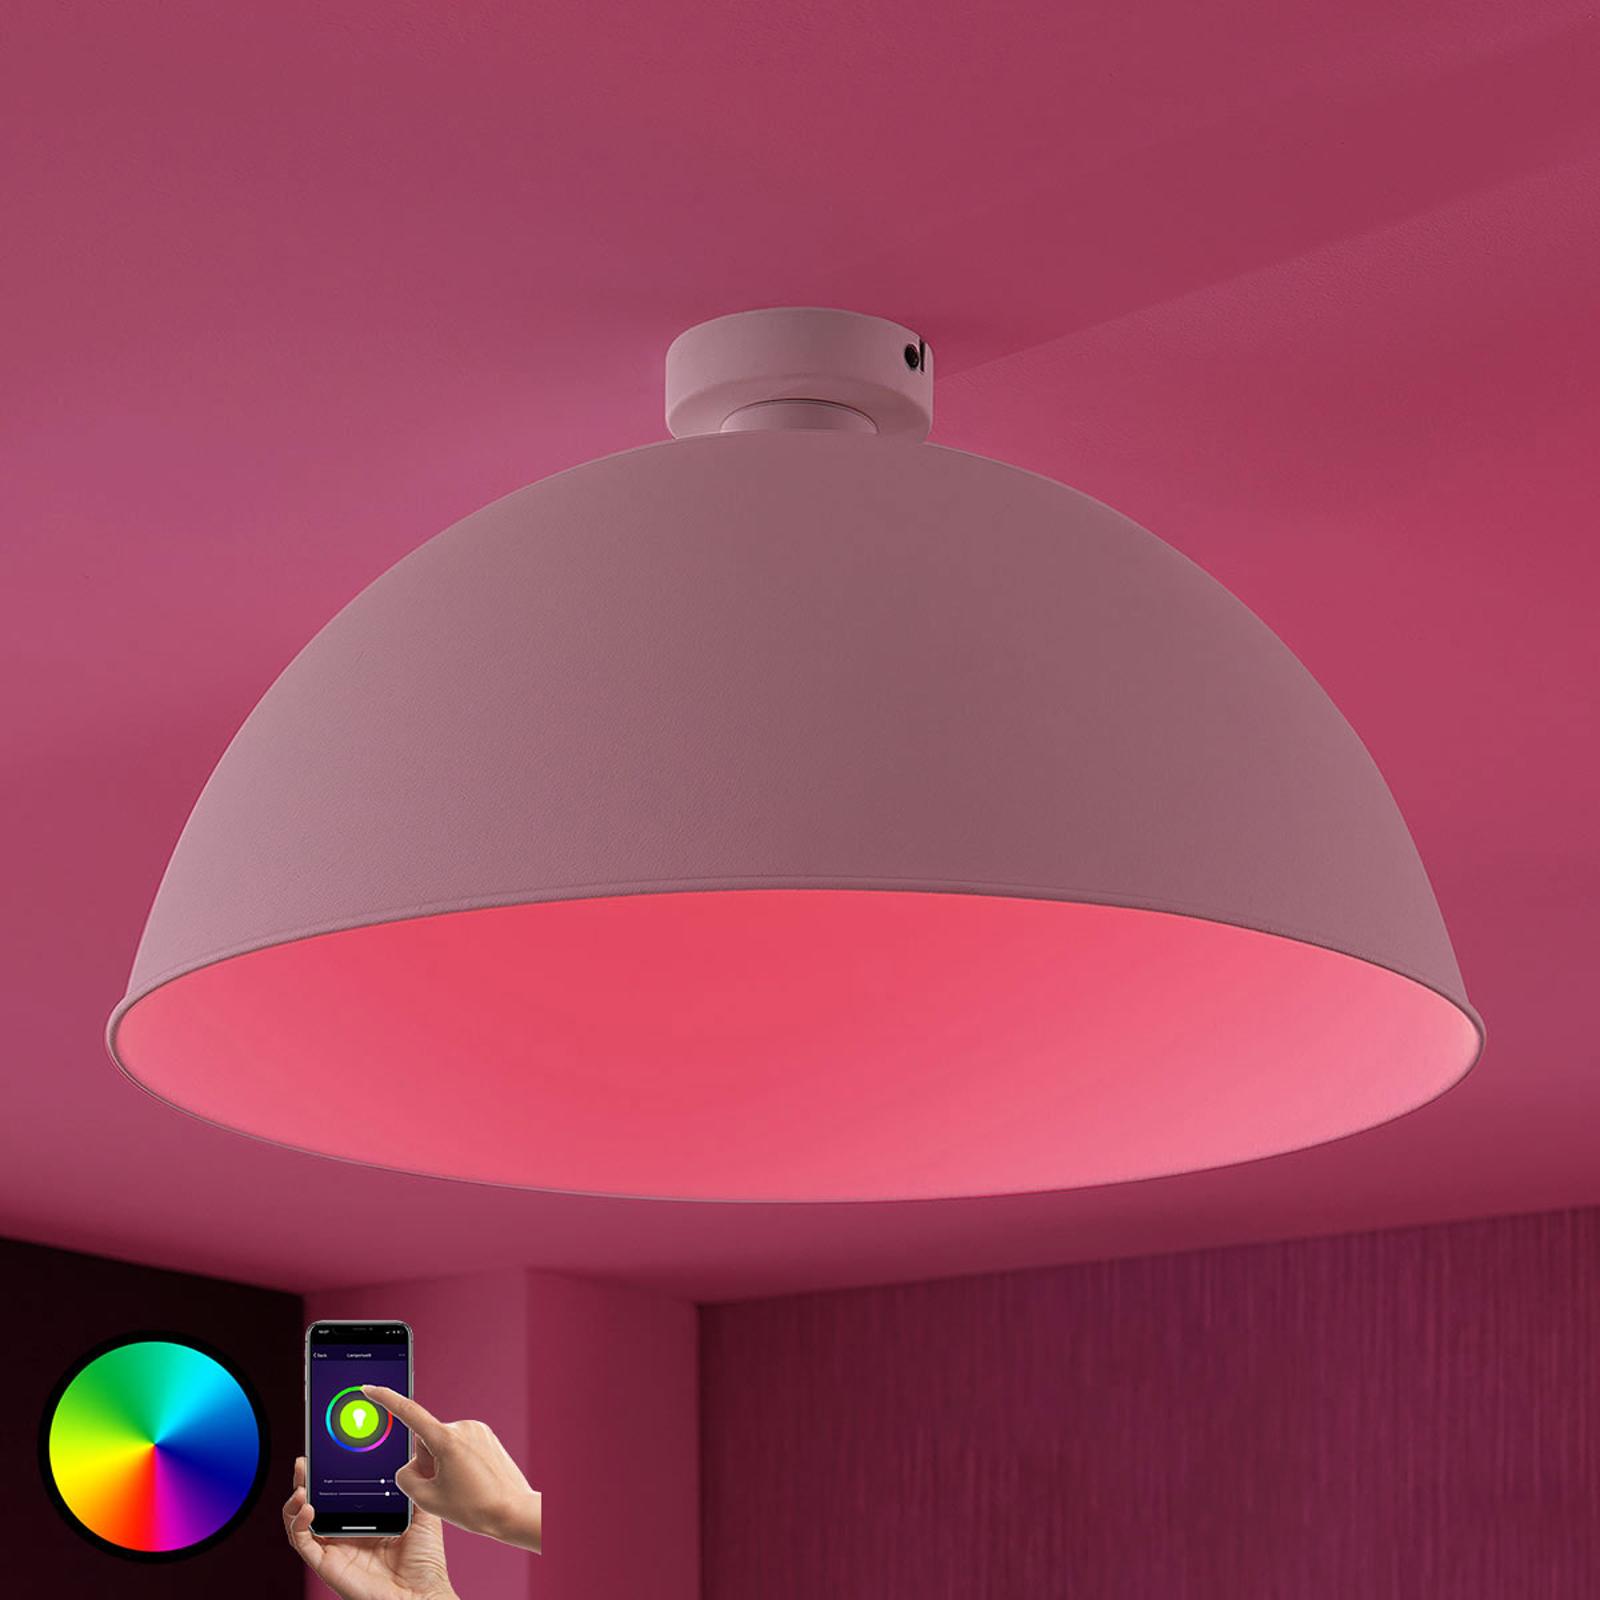 Lampa sufitowa LED Bowl WiFi 51cm biała